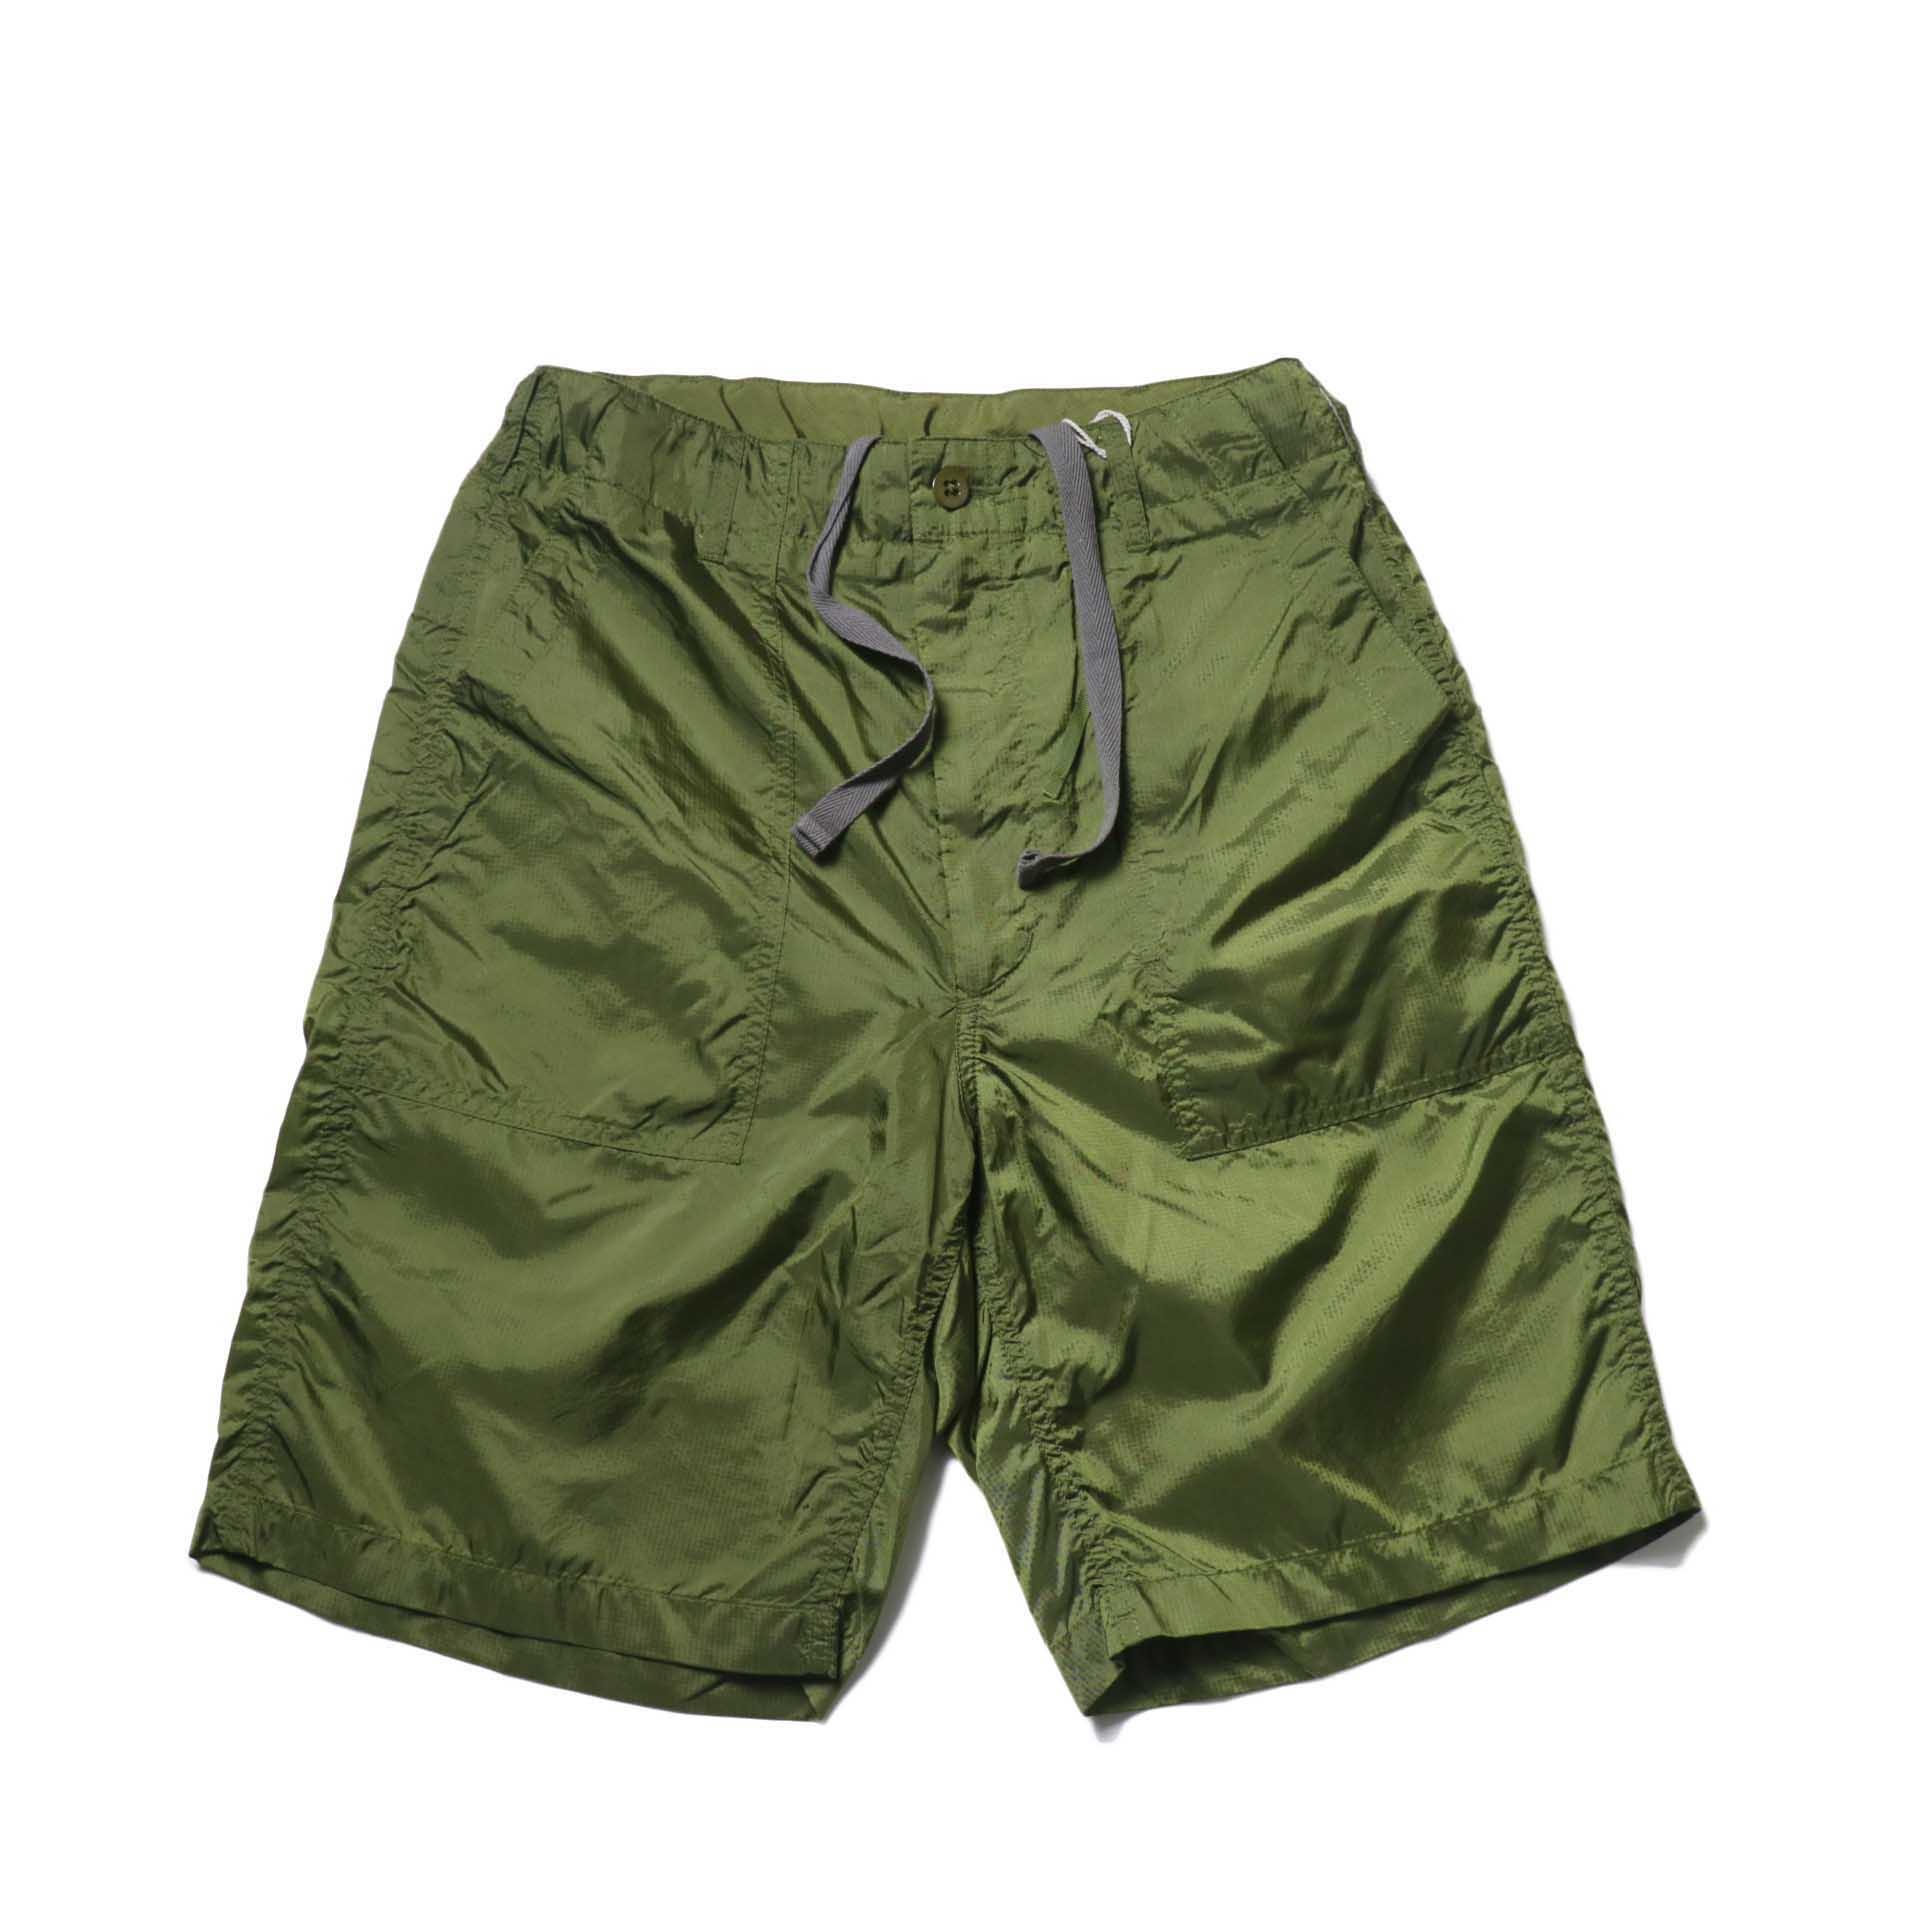 Engineered Garments / Fatigue Short -Micro Ripstop (Olive)